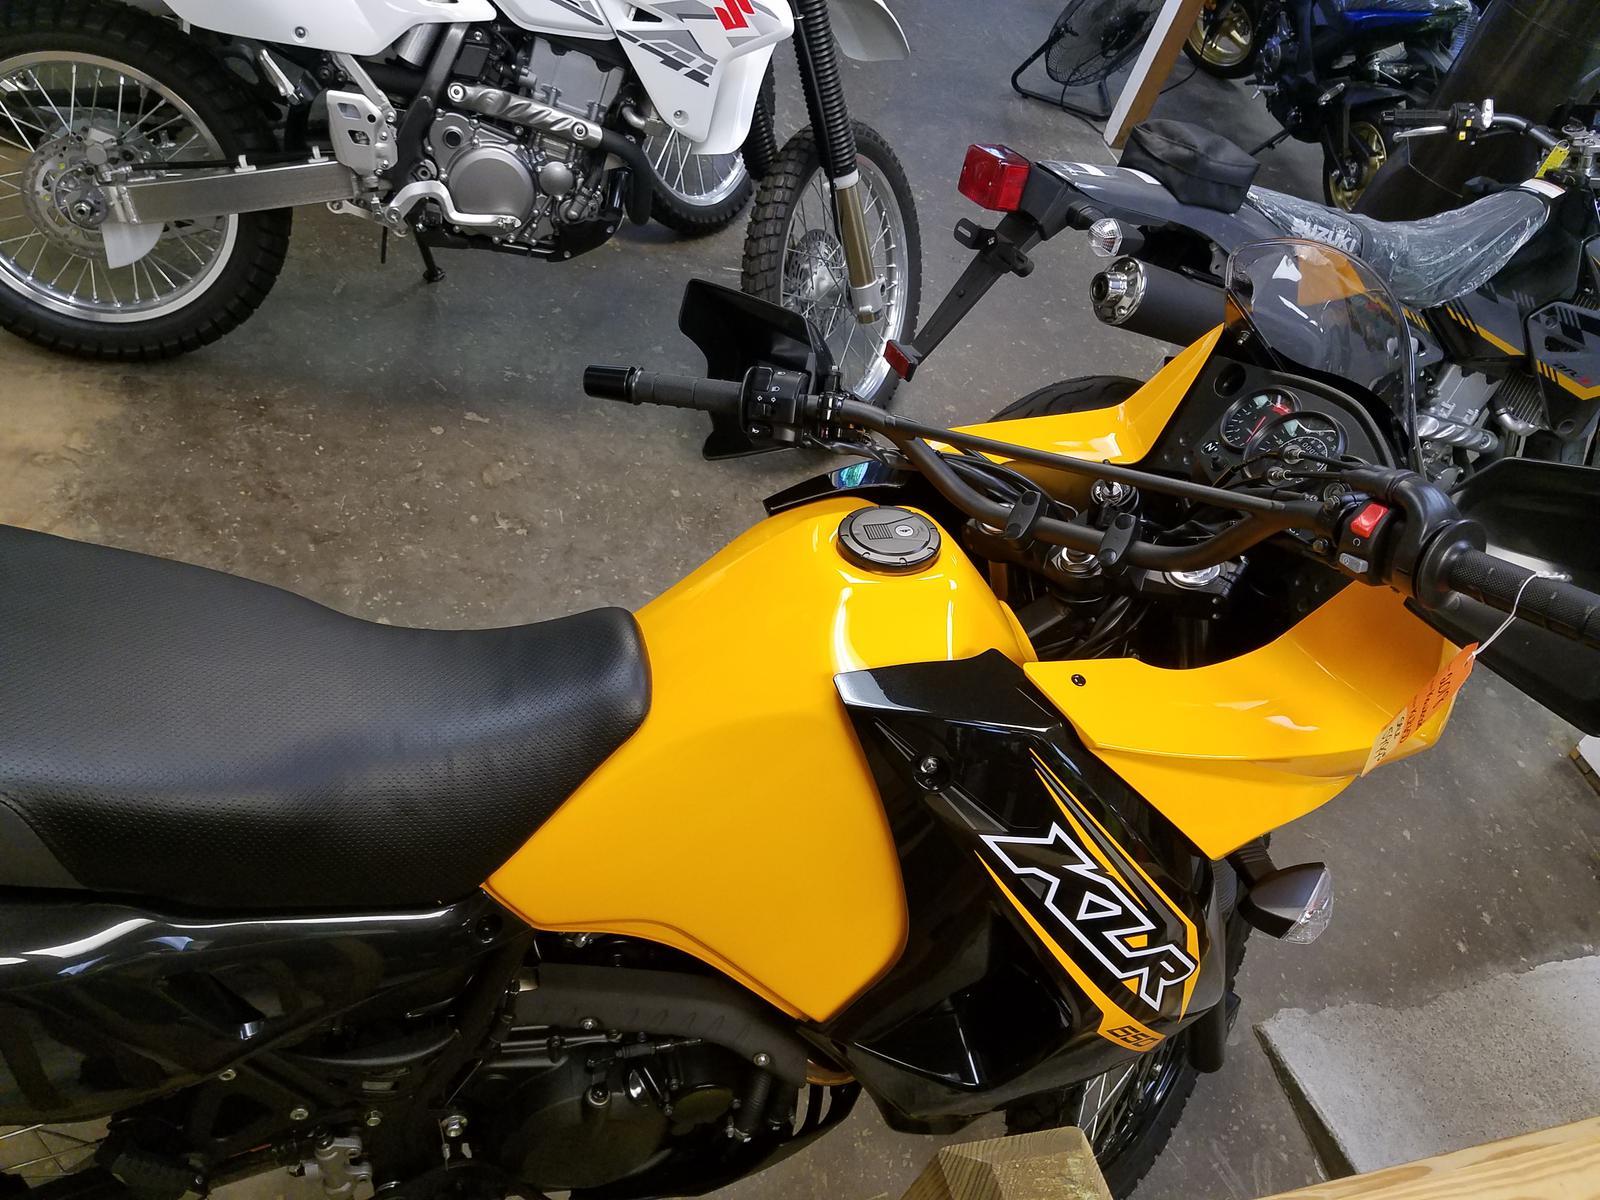 Marvelous 2018 Kawasaki Klr650 For Sale In Bridgeport Wv Leesons Creativecarmelina Interior Chair Design Creativecarmelinacom